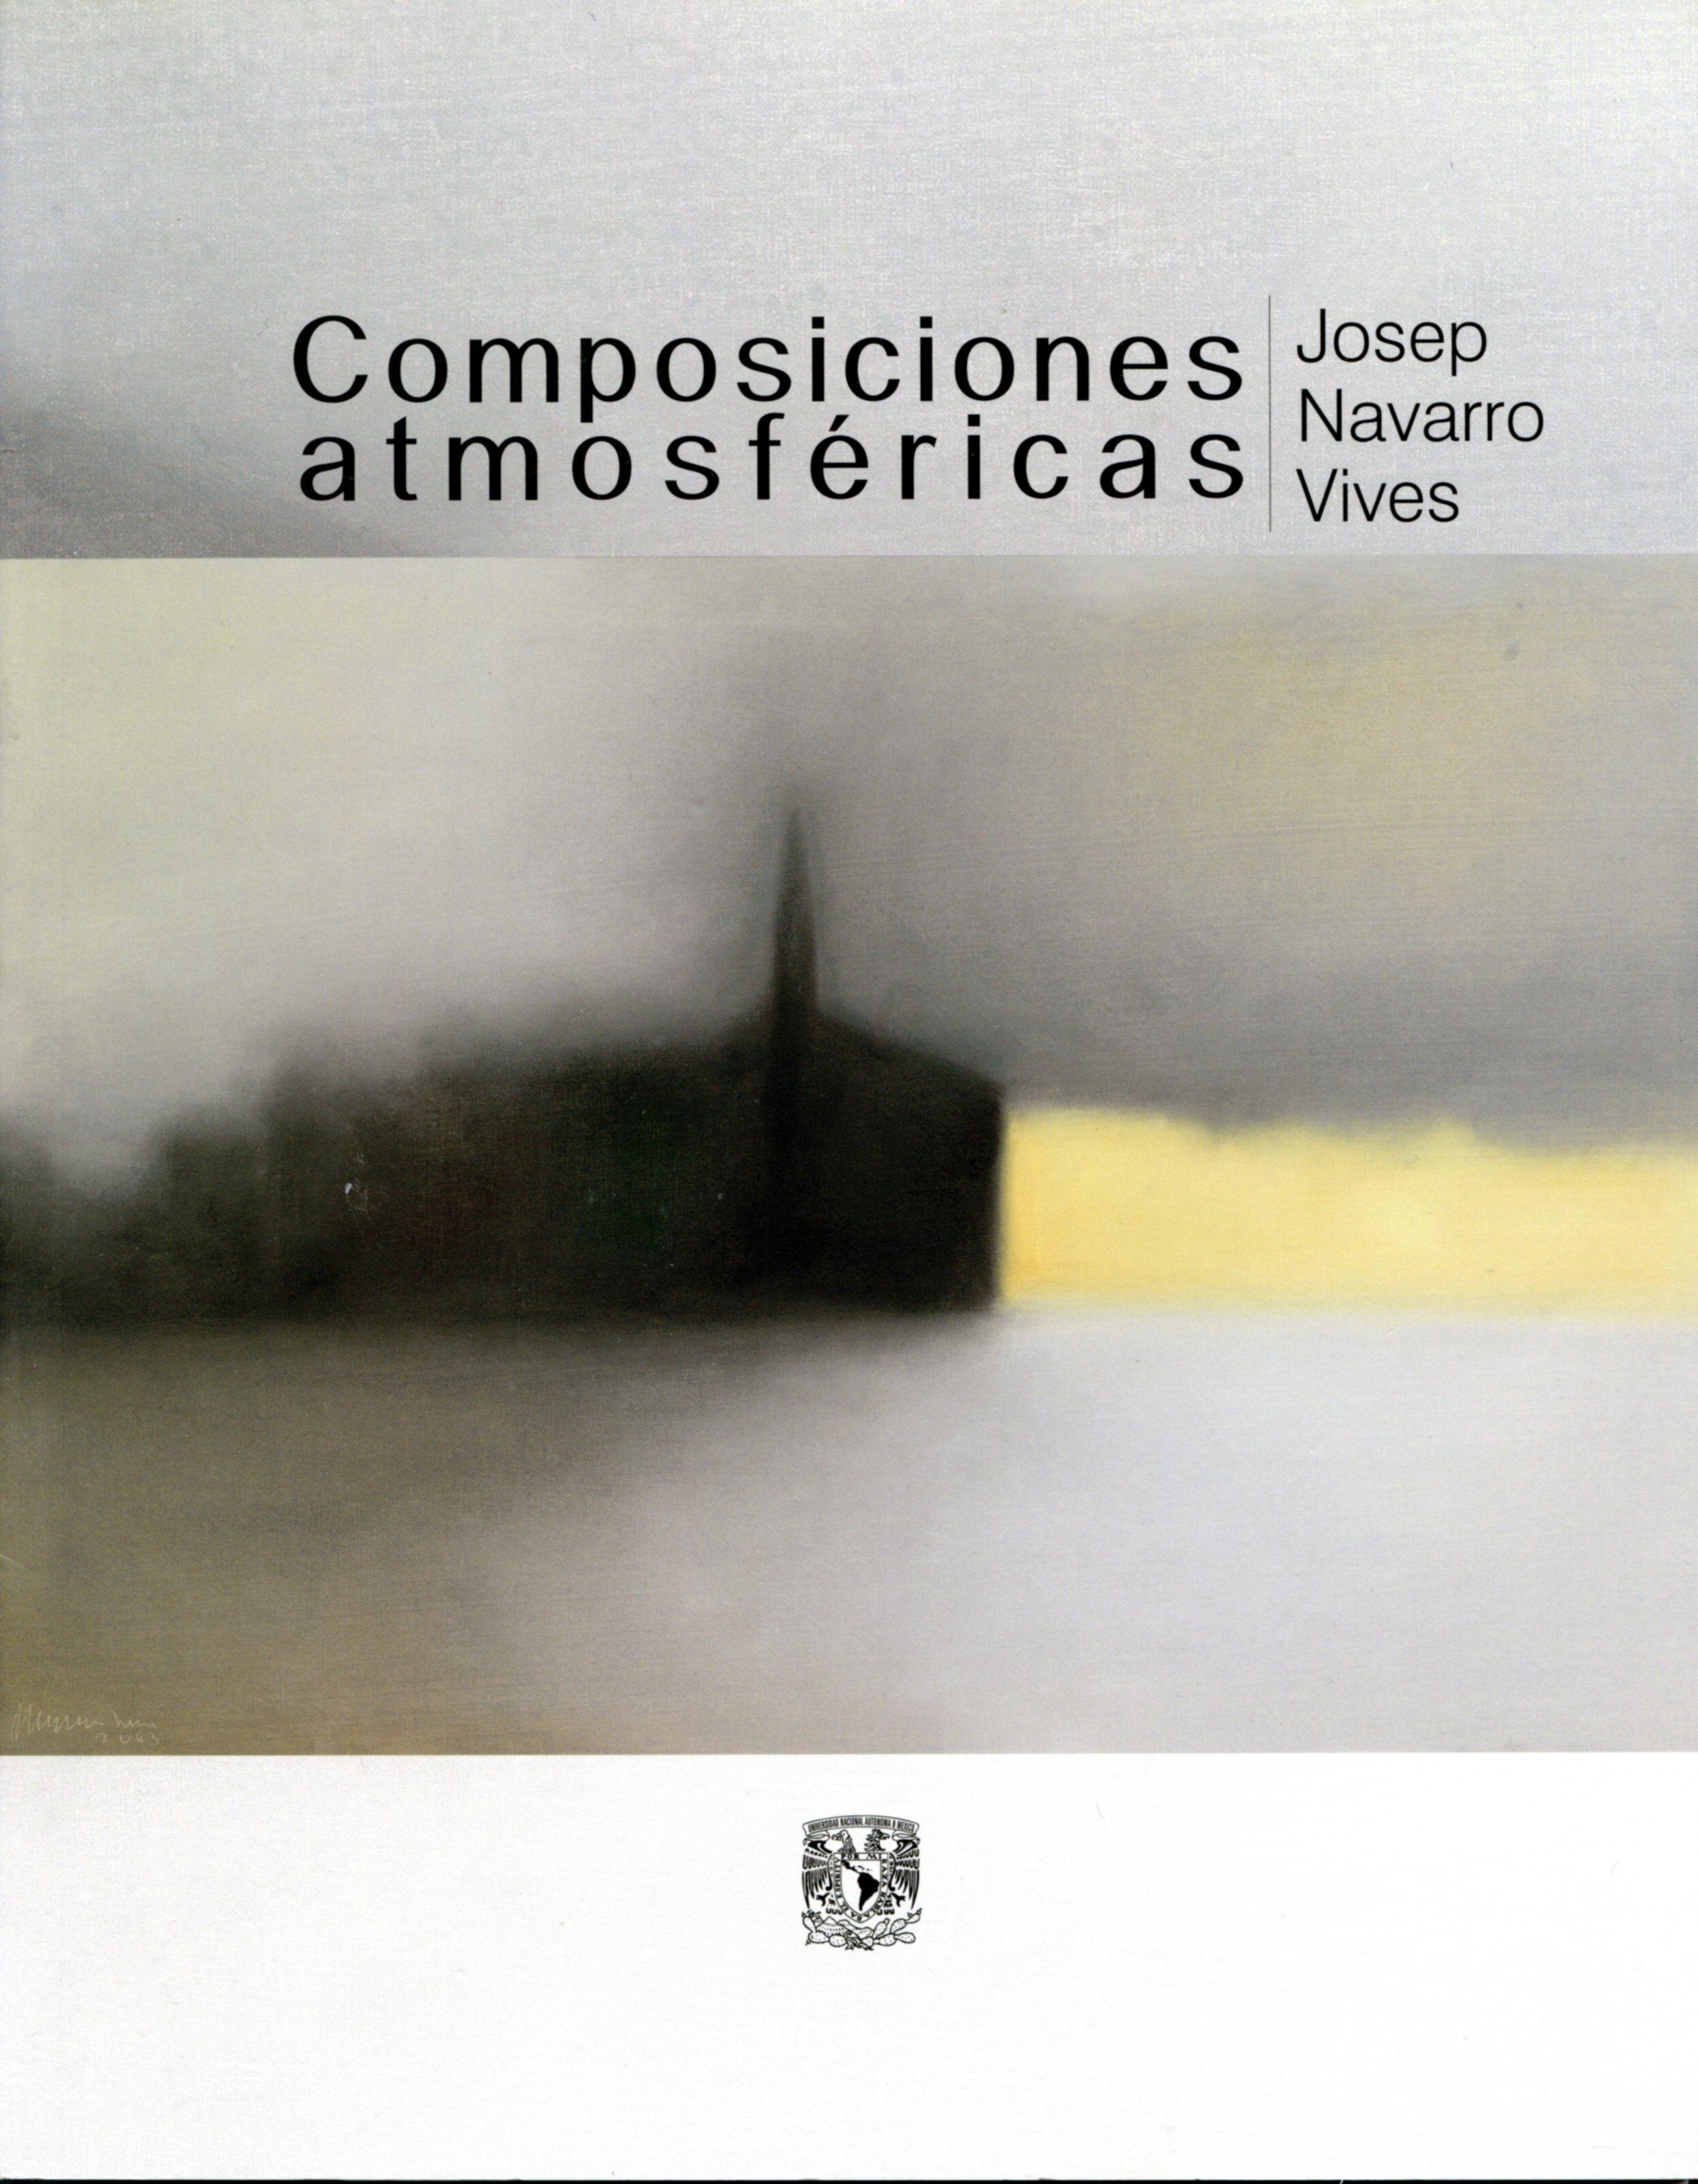 Composiciones atmosféricas